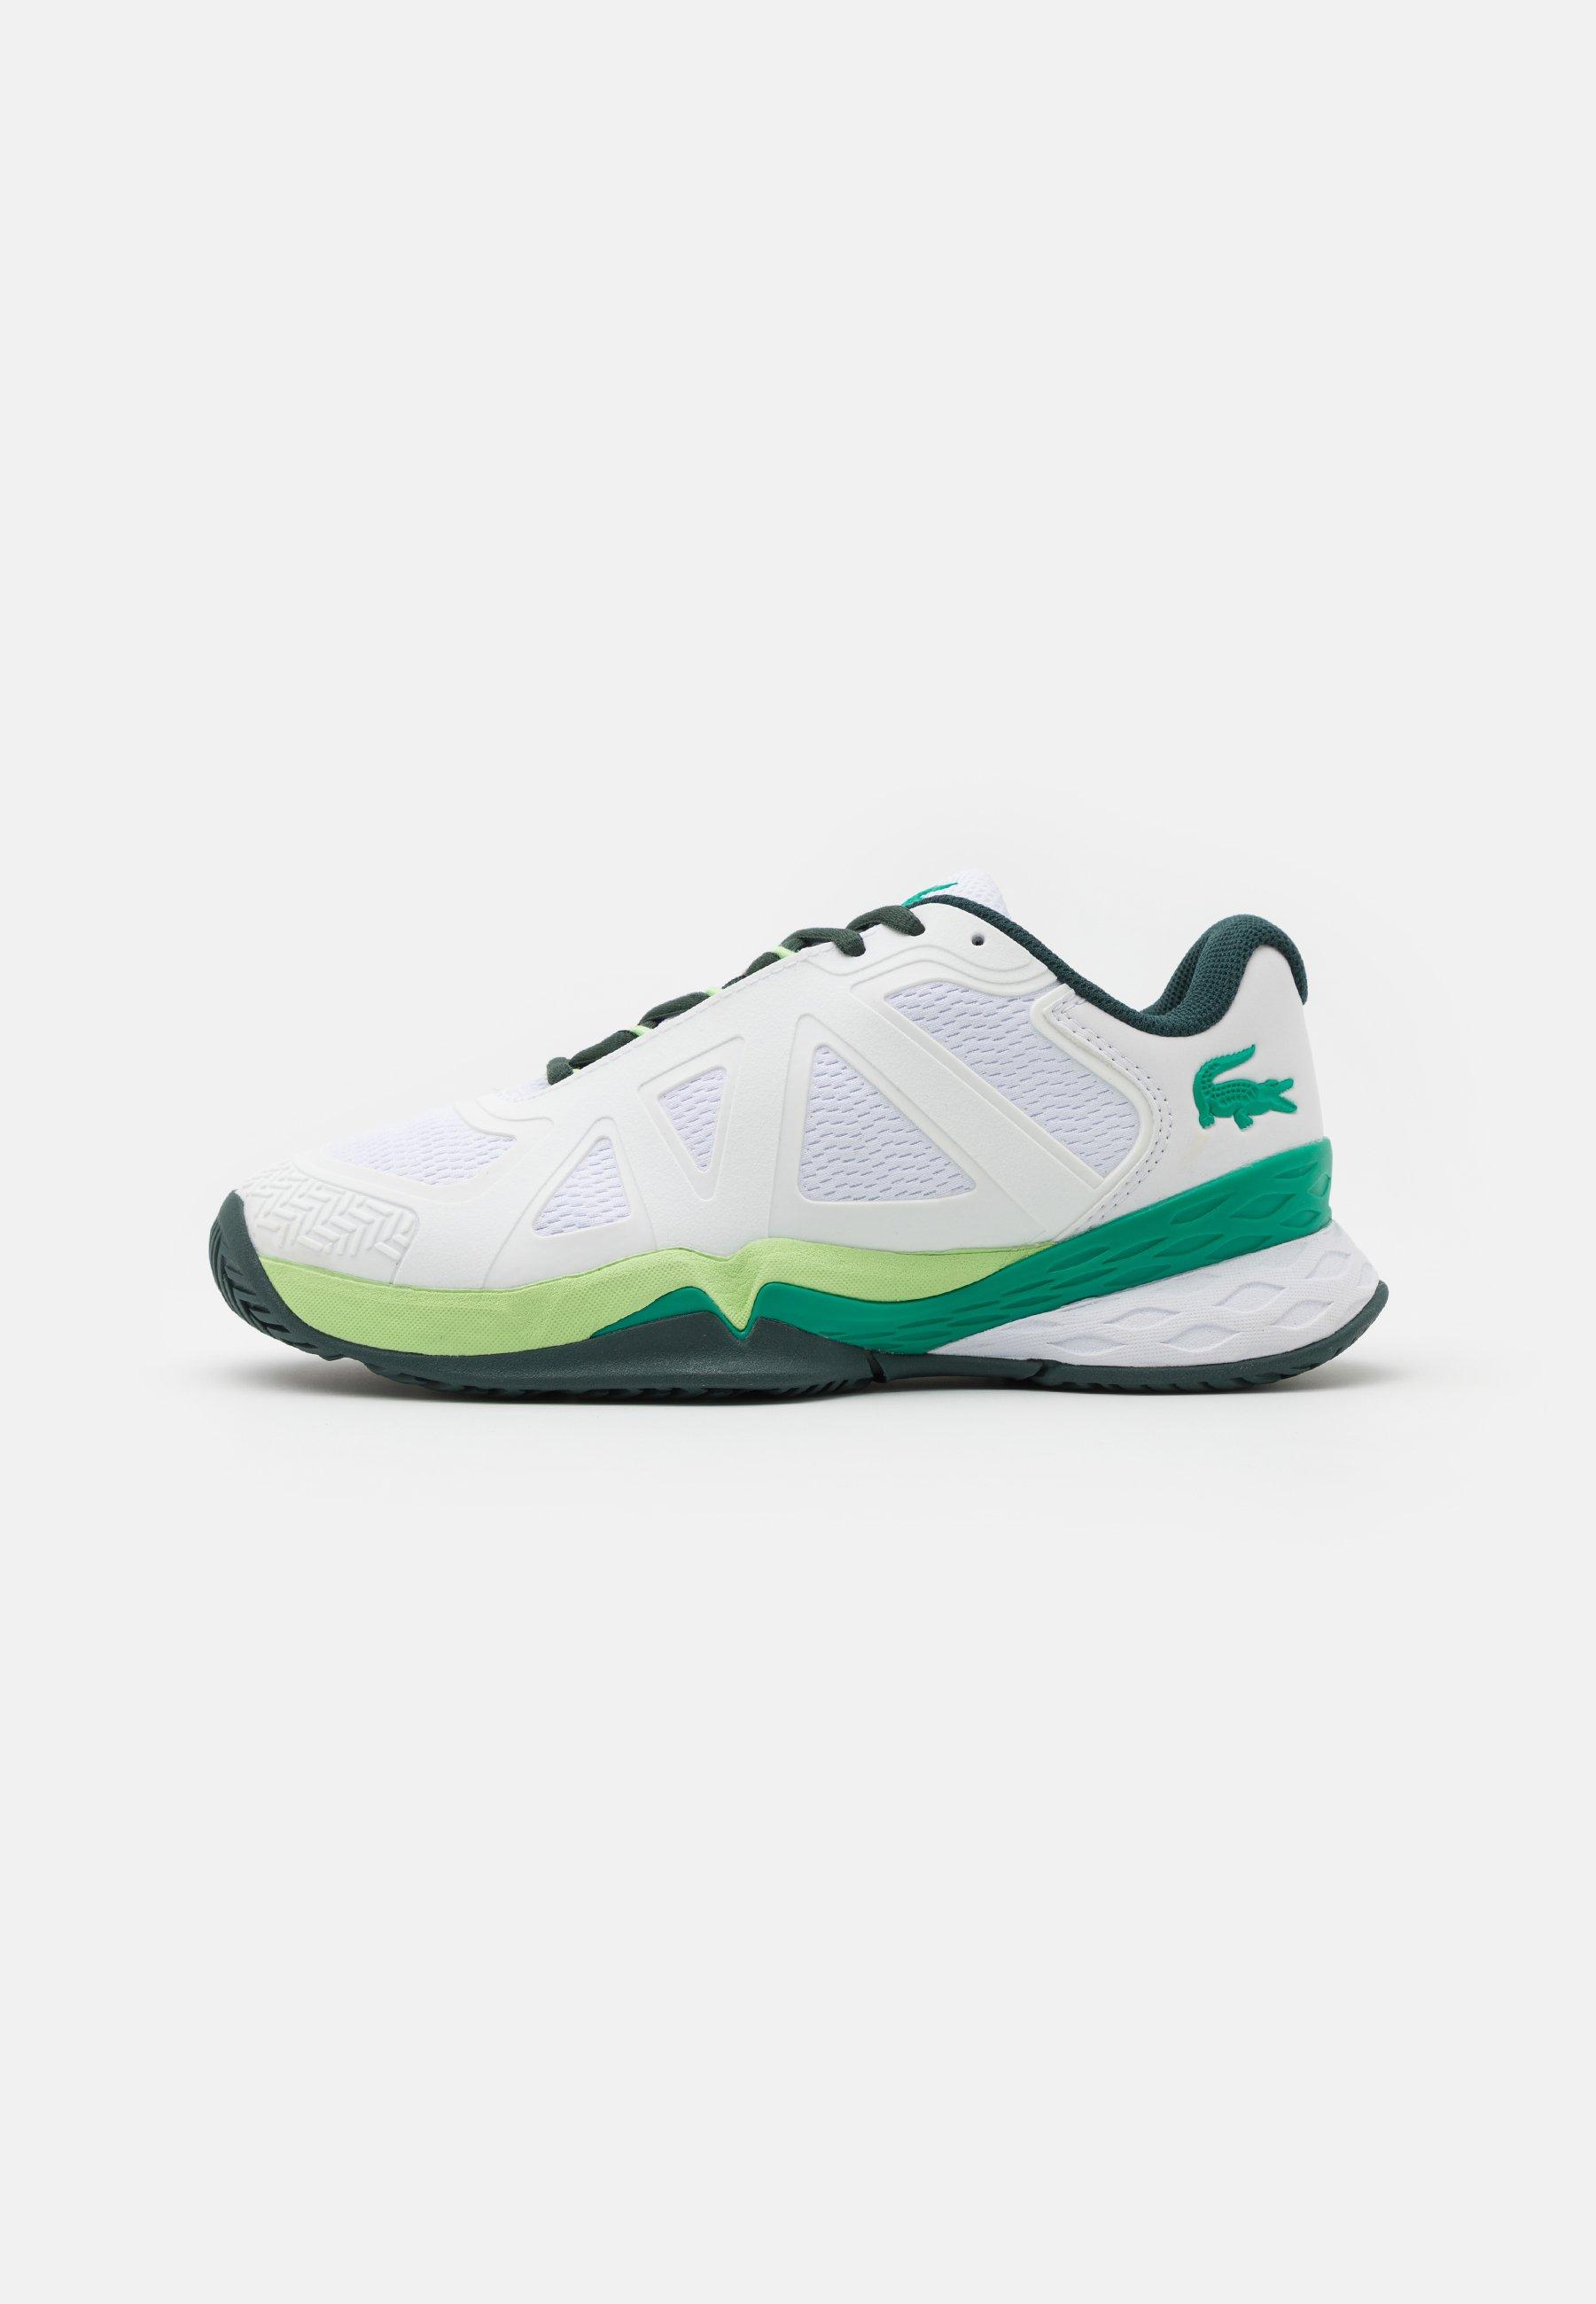 Femme LC SCALE II - Chaussures de tennis toutes surfaces - white/green